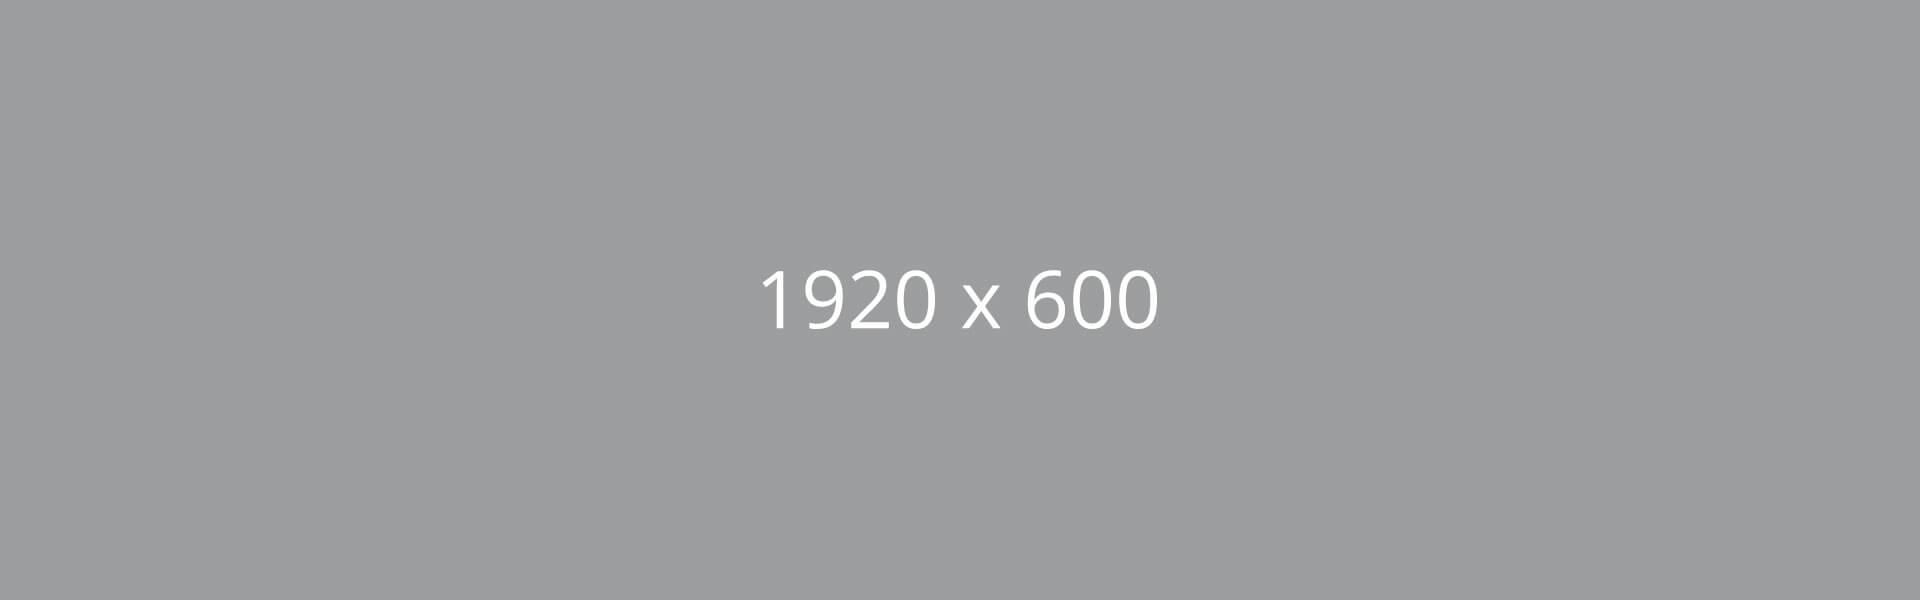 platzhalter-1920x600